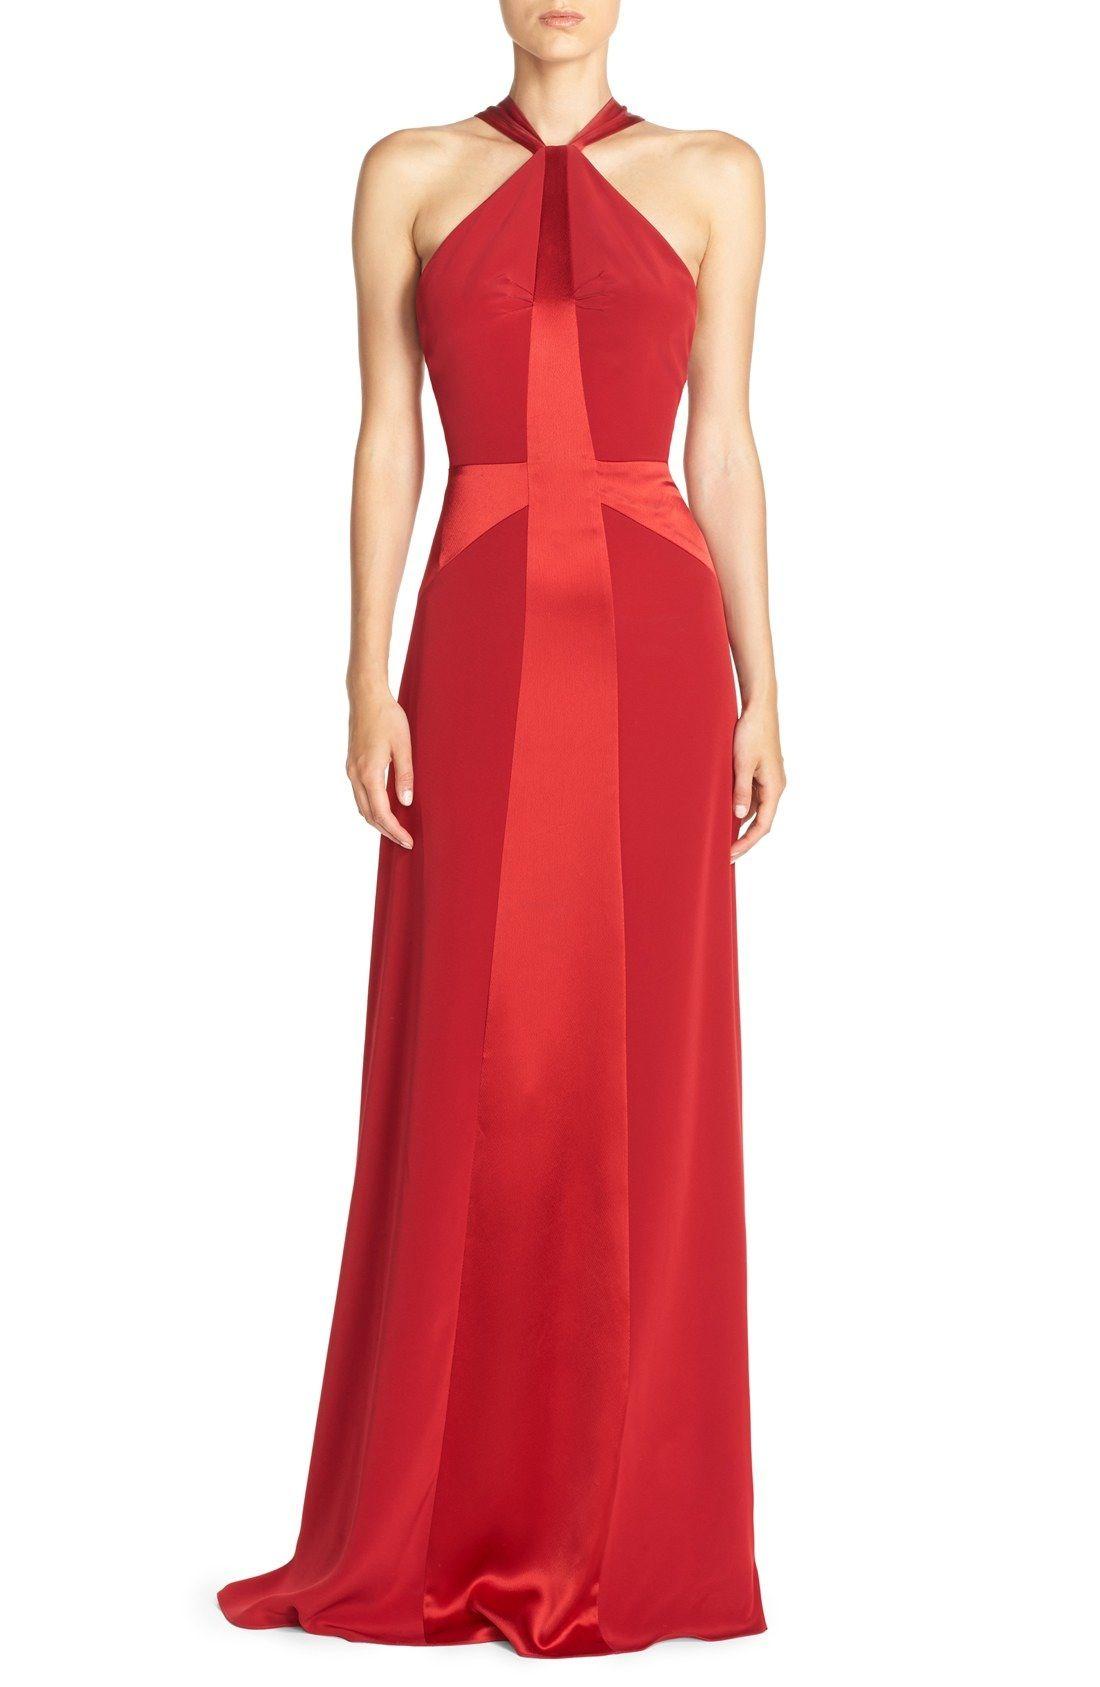 Jill Jill Stuart Racerback Crisscross Gown available at #Nordstrom ...